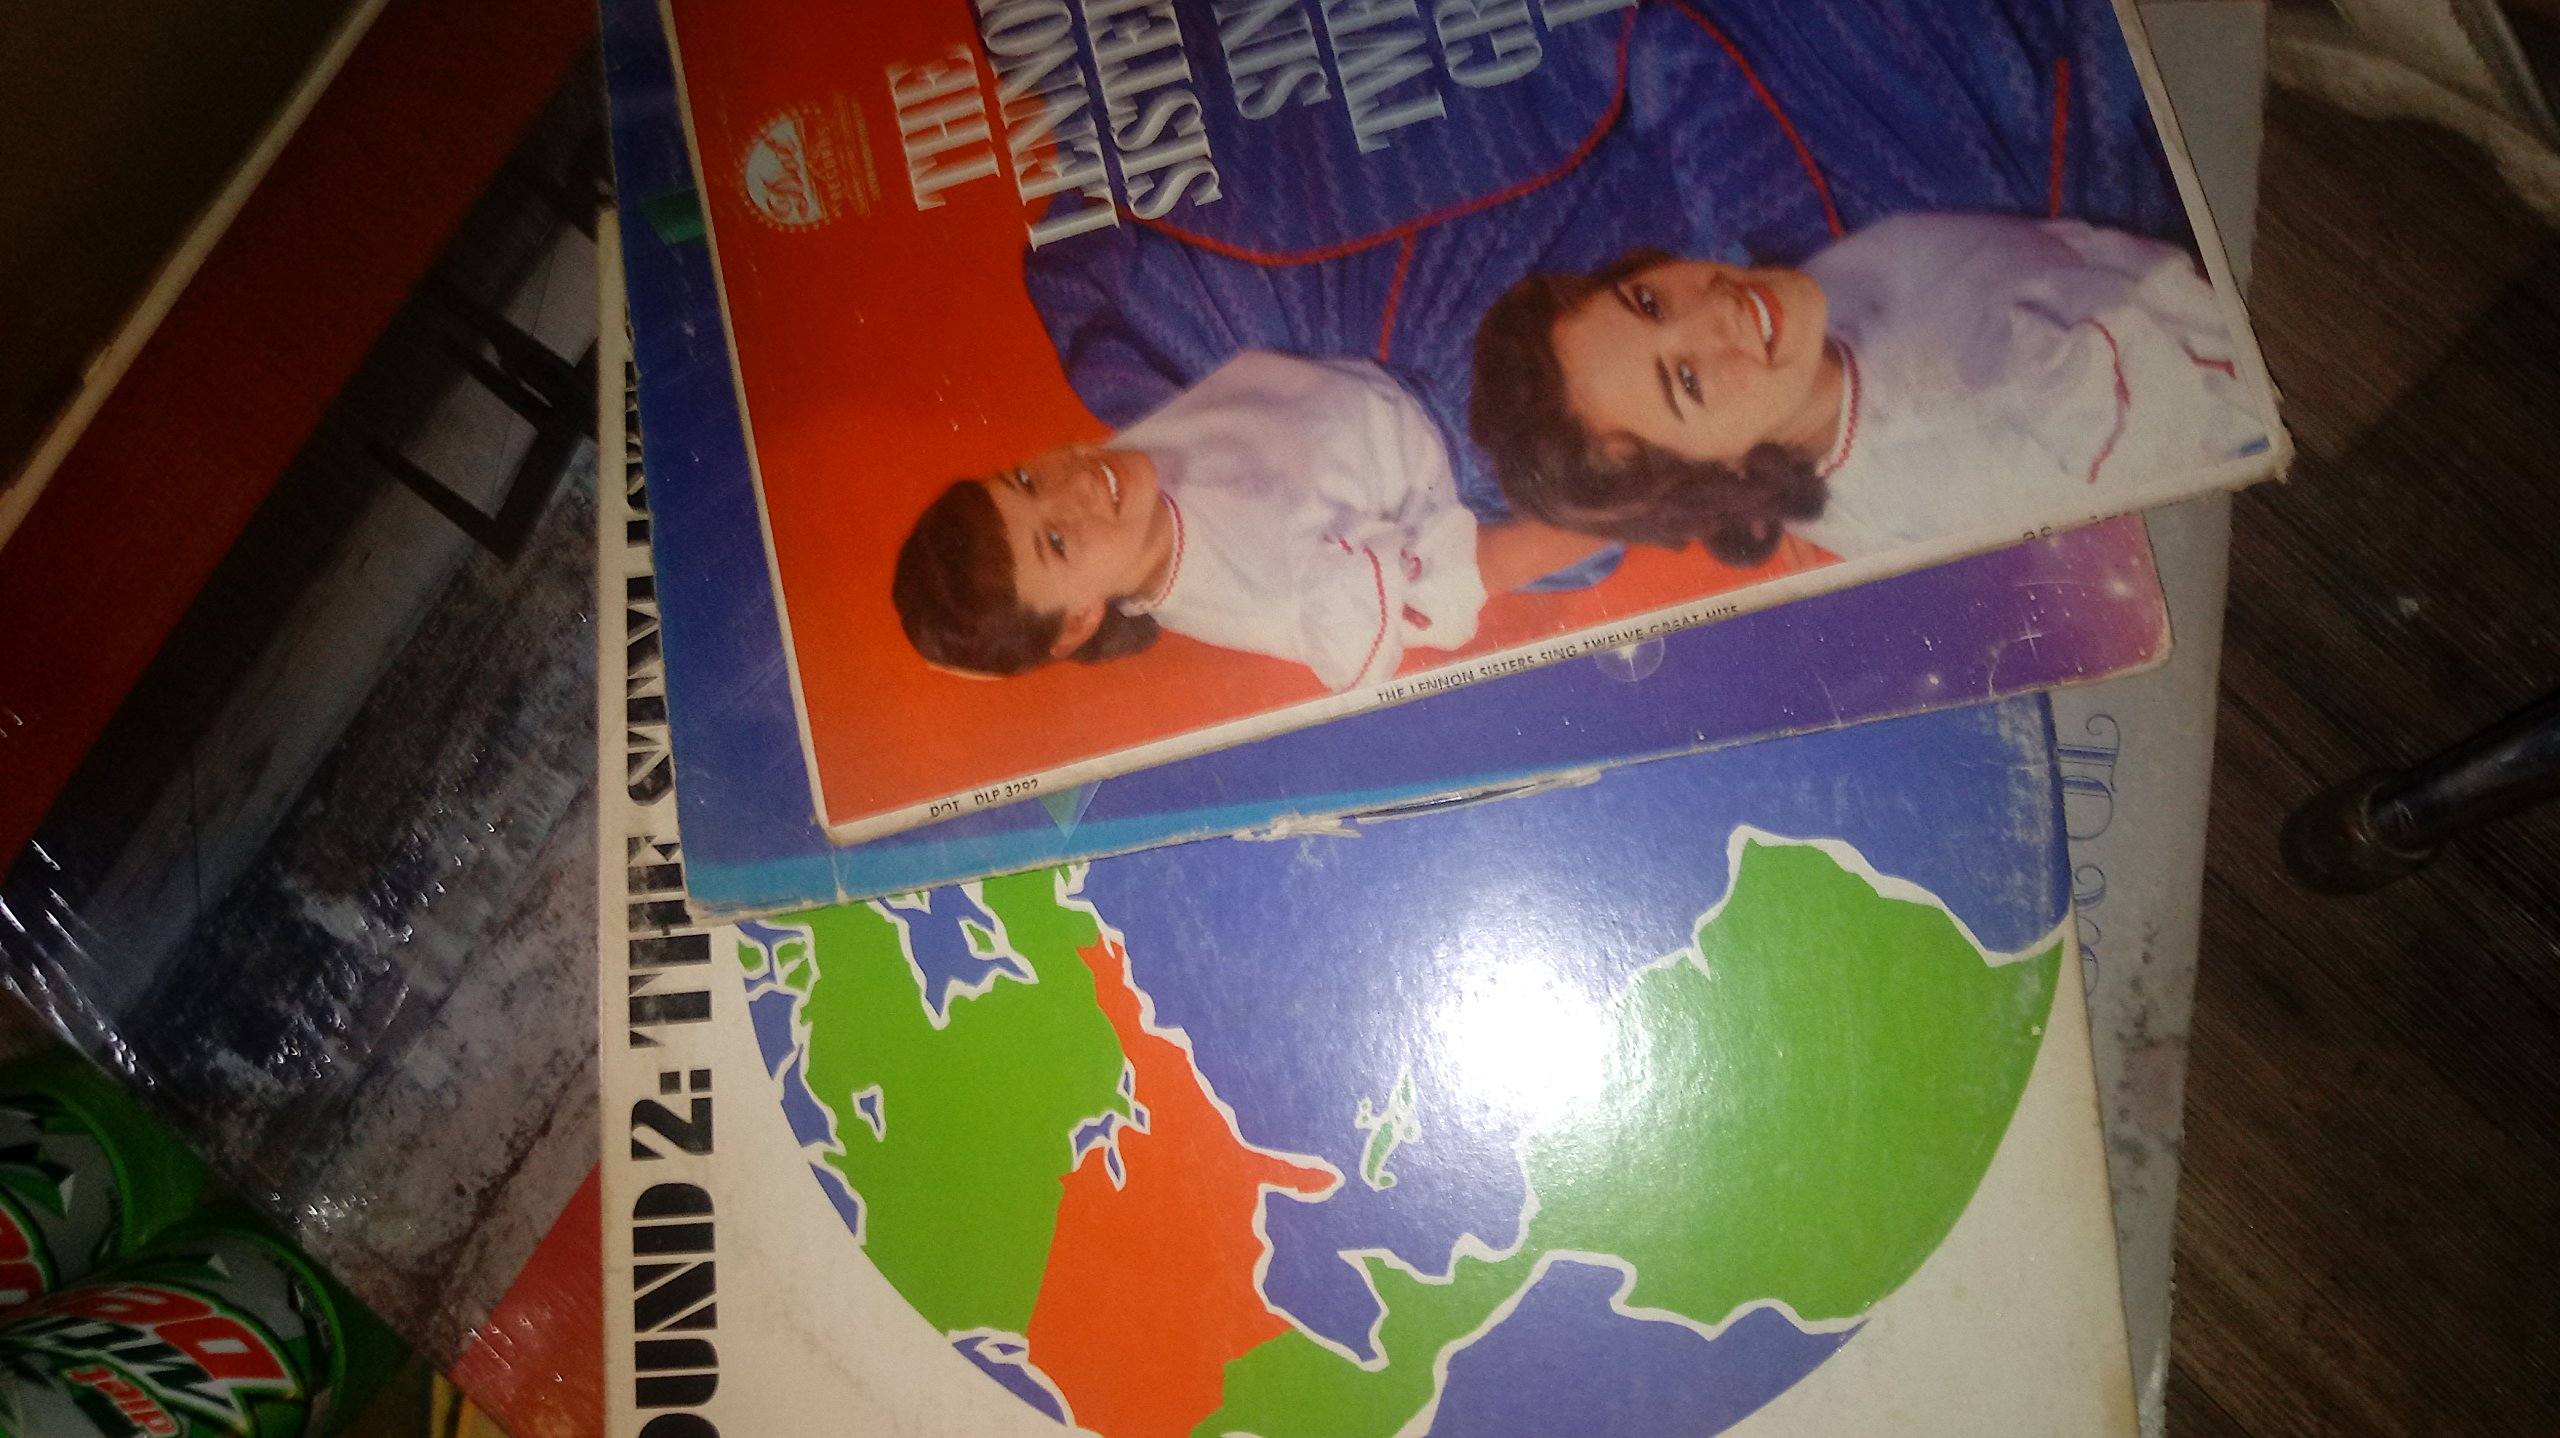 VinylShopUS - Mystery Box Vinyl Records Music Albums LPS Bulk Lot Randomly Chosen Vintage Original LPs With Sleeves Lot of 100 by VinylShopUS (Image #2)